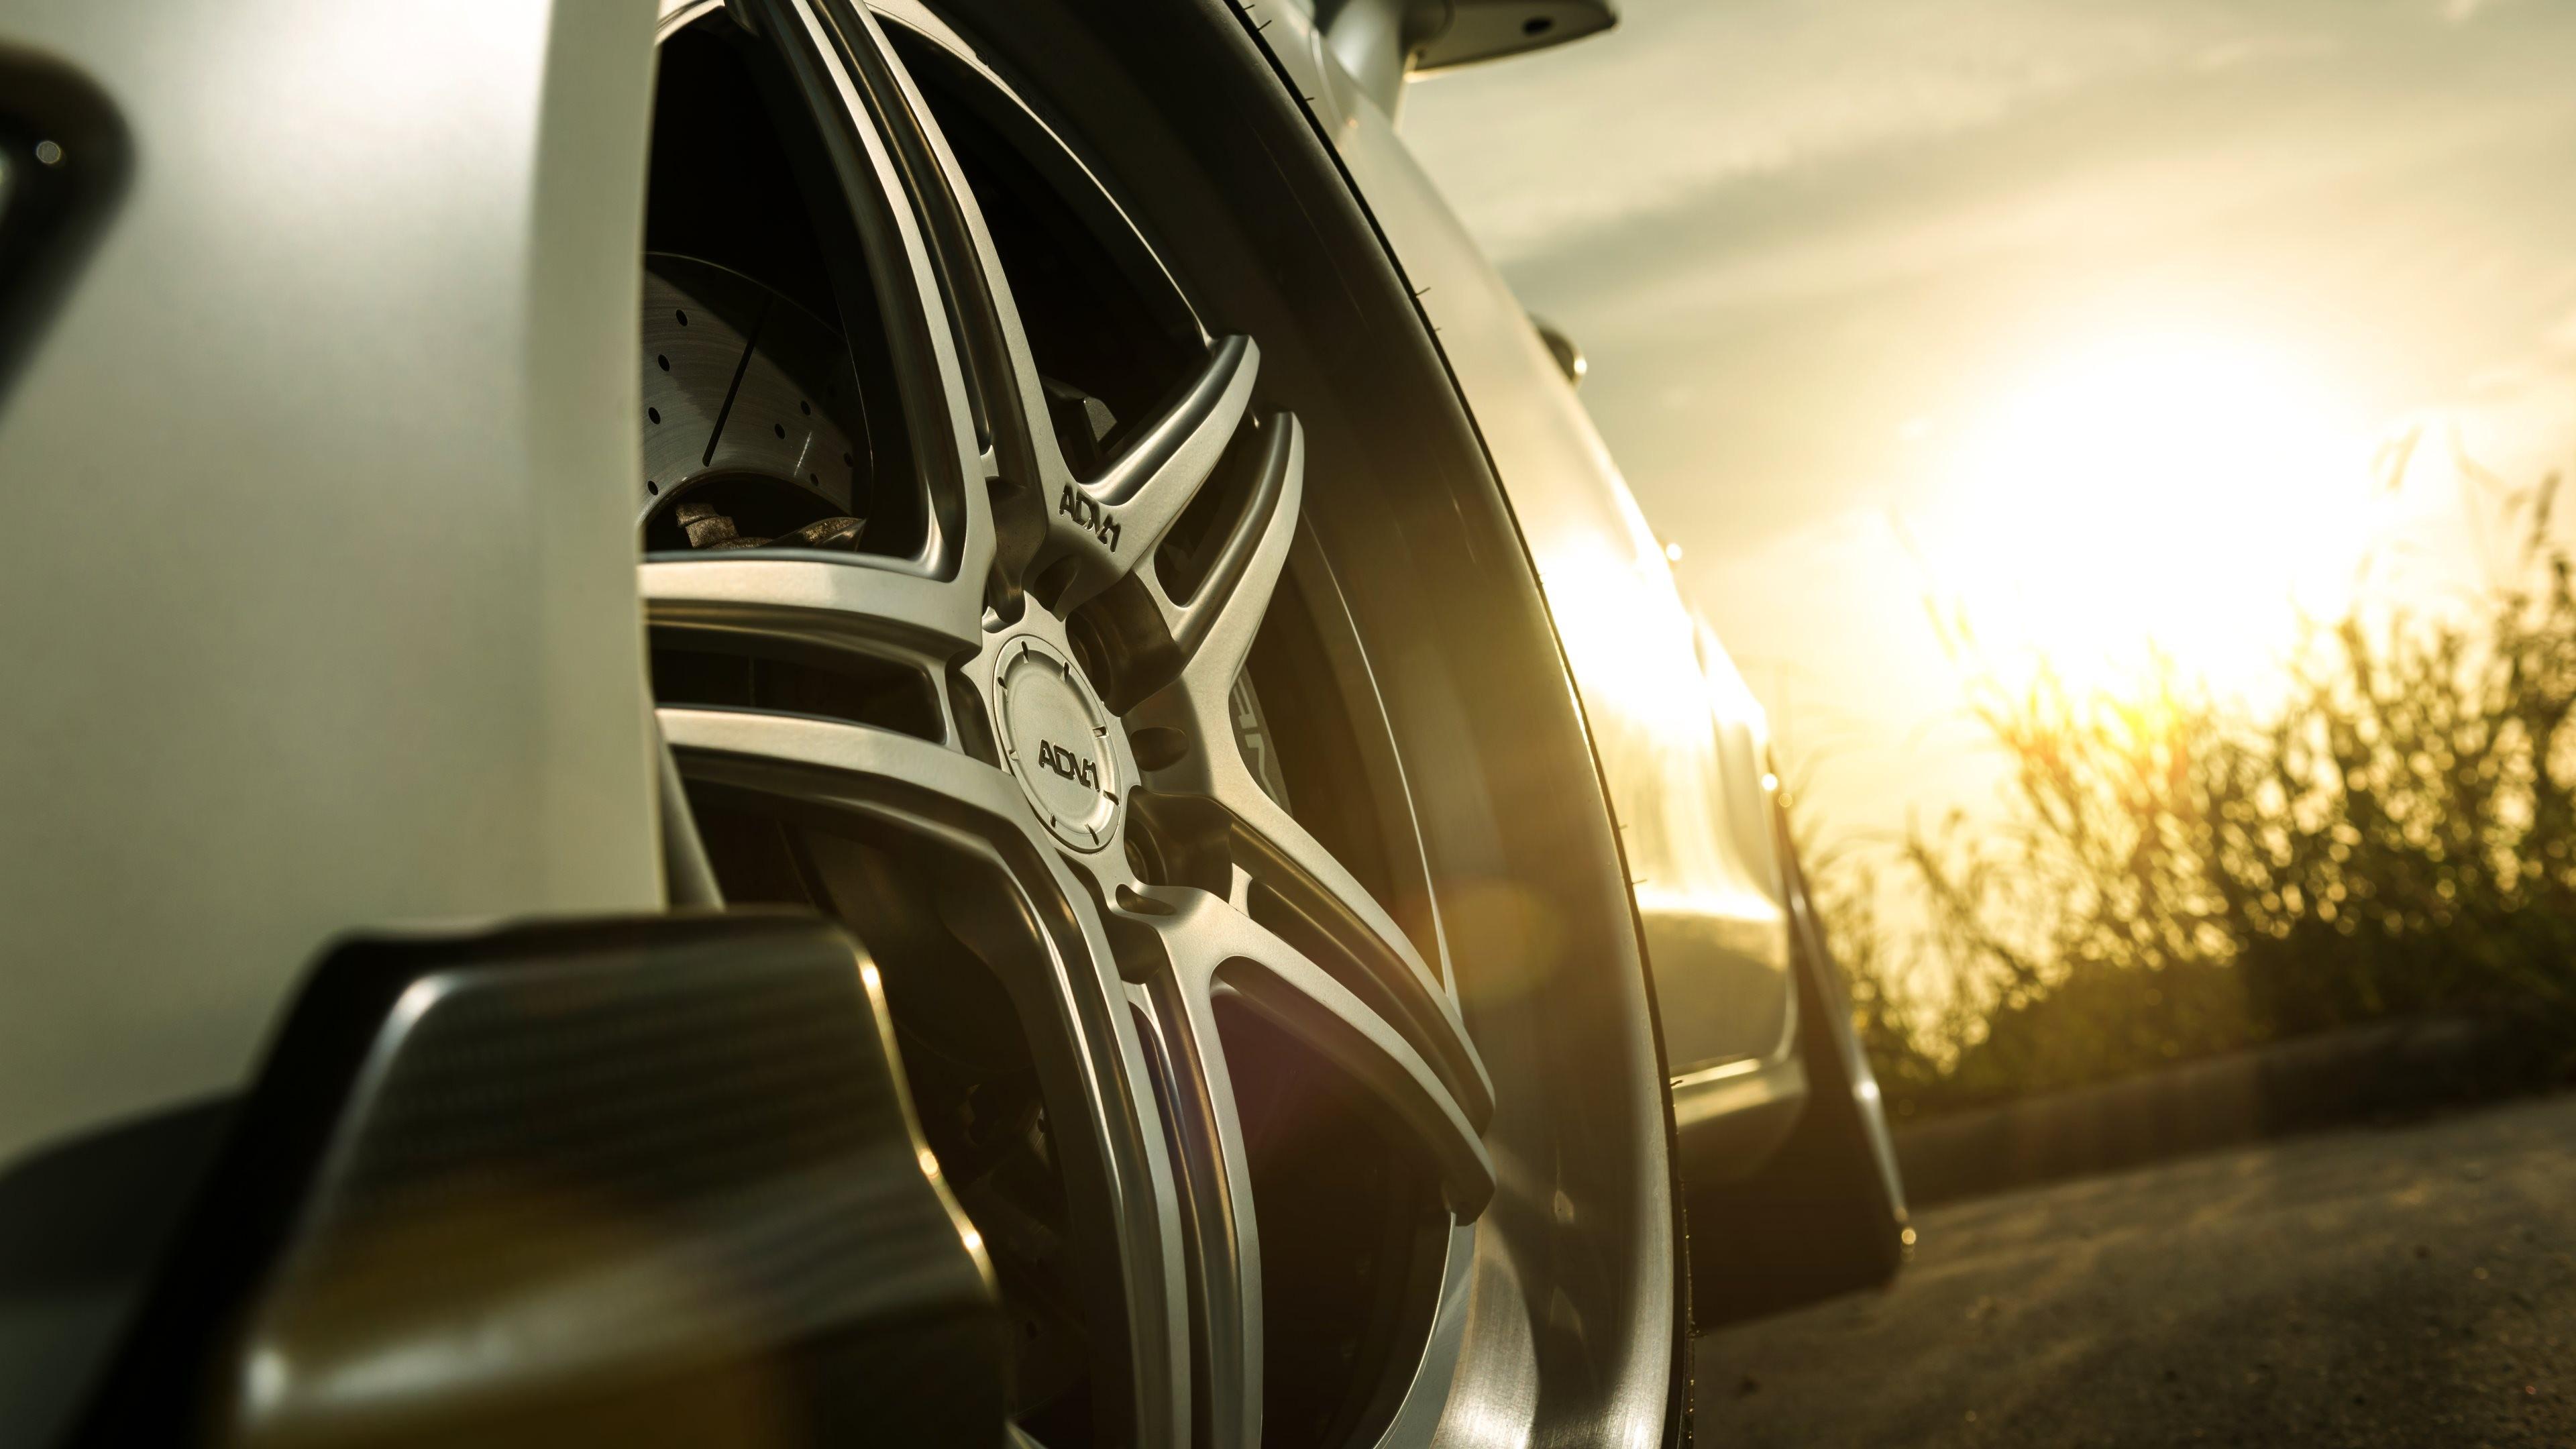 ultra hd wallpapers 8k cars,vehicle door,wheel,vehicle,mode of transport,automotive design